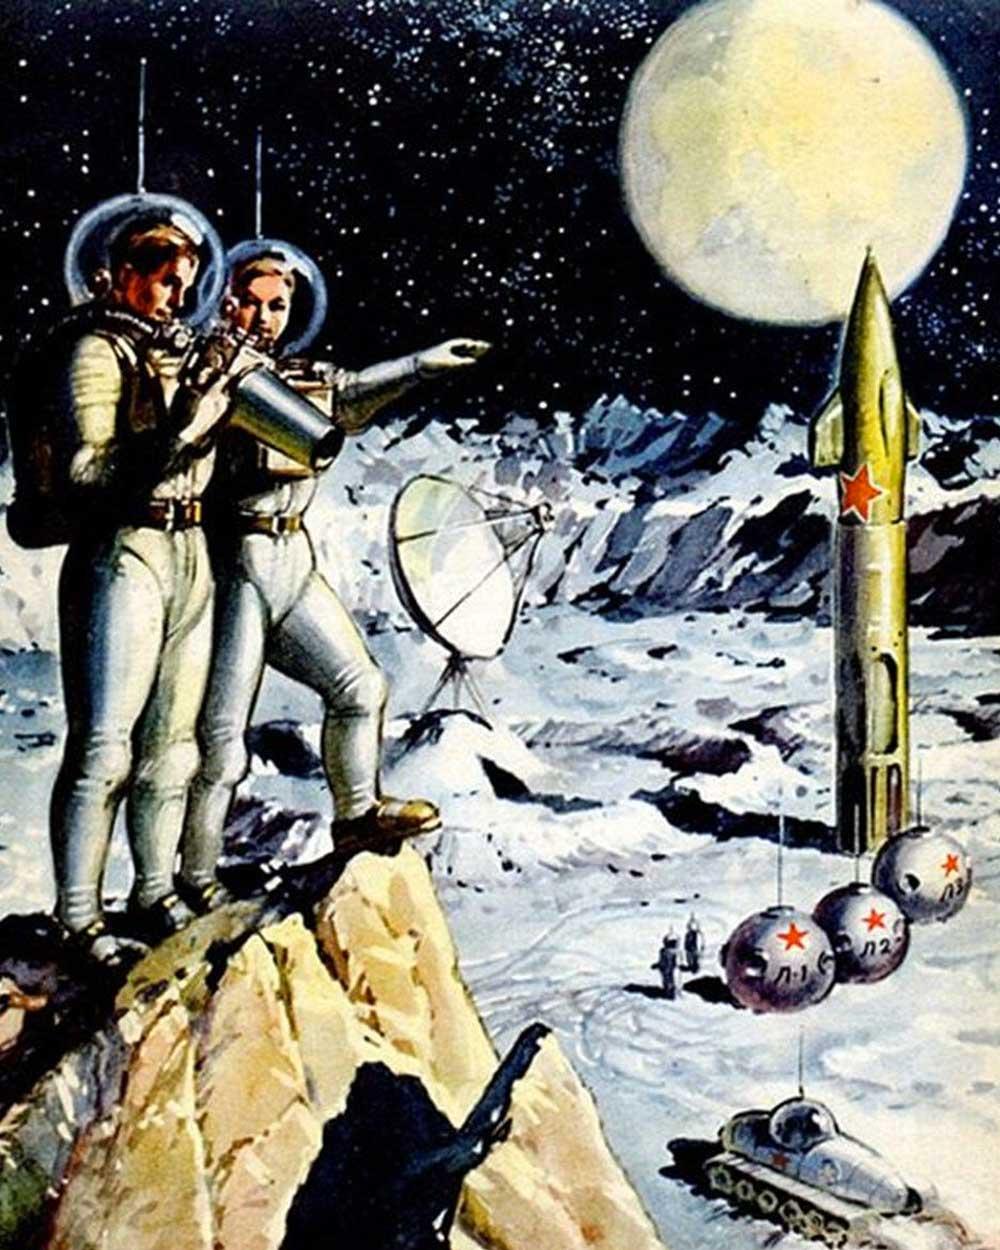 Retro futurism Aesthetic of 1950s Space AgeTM cover, Russia 1953